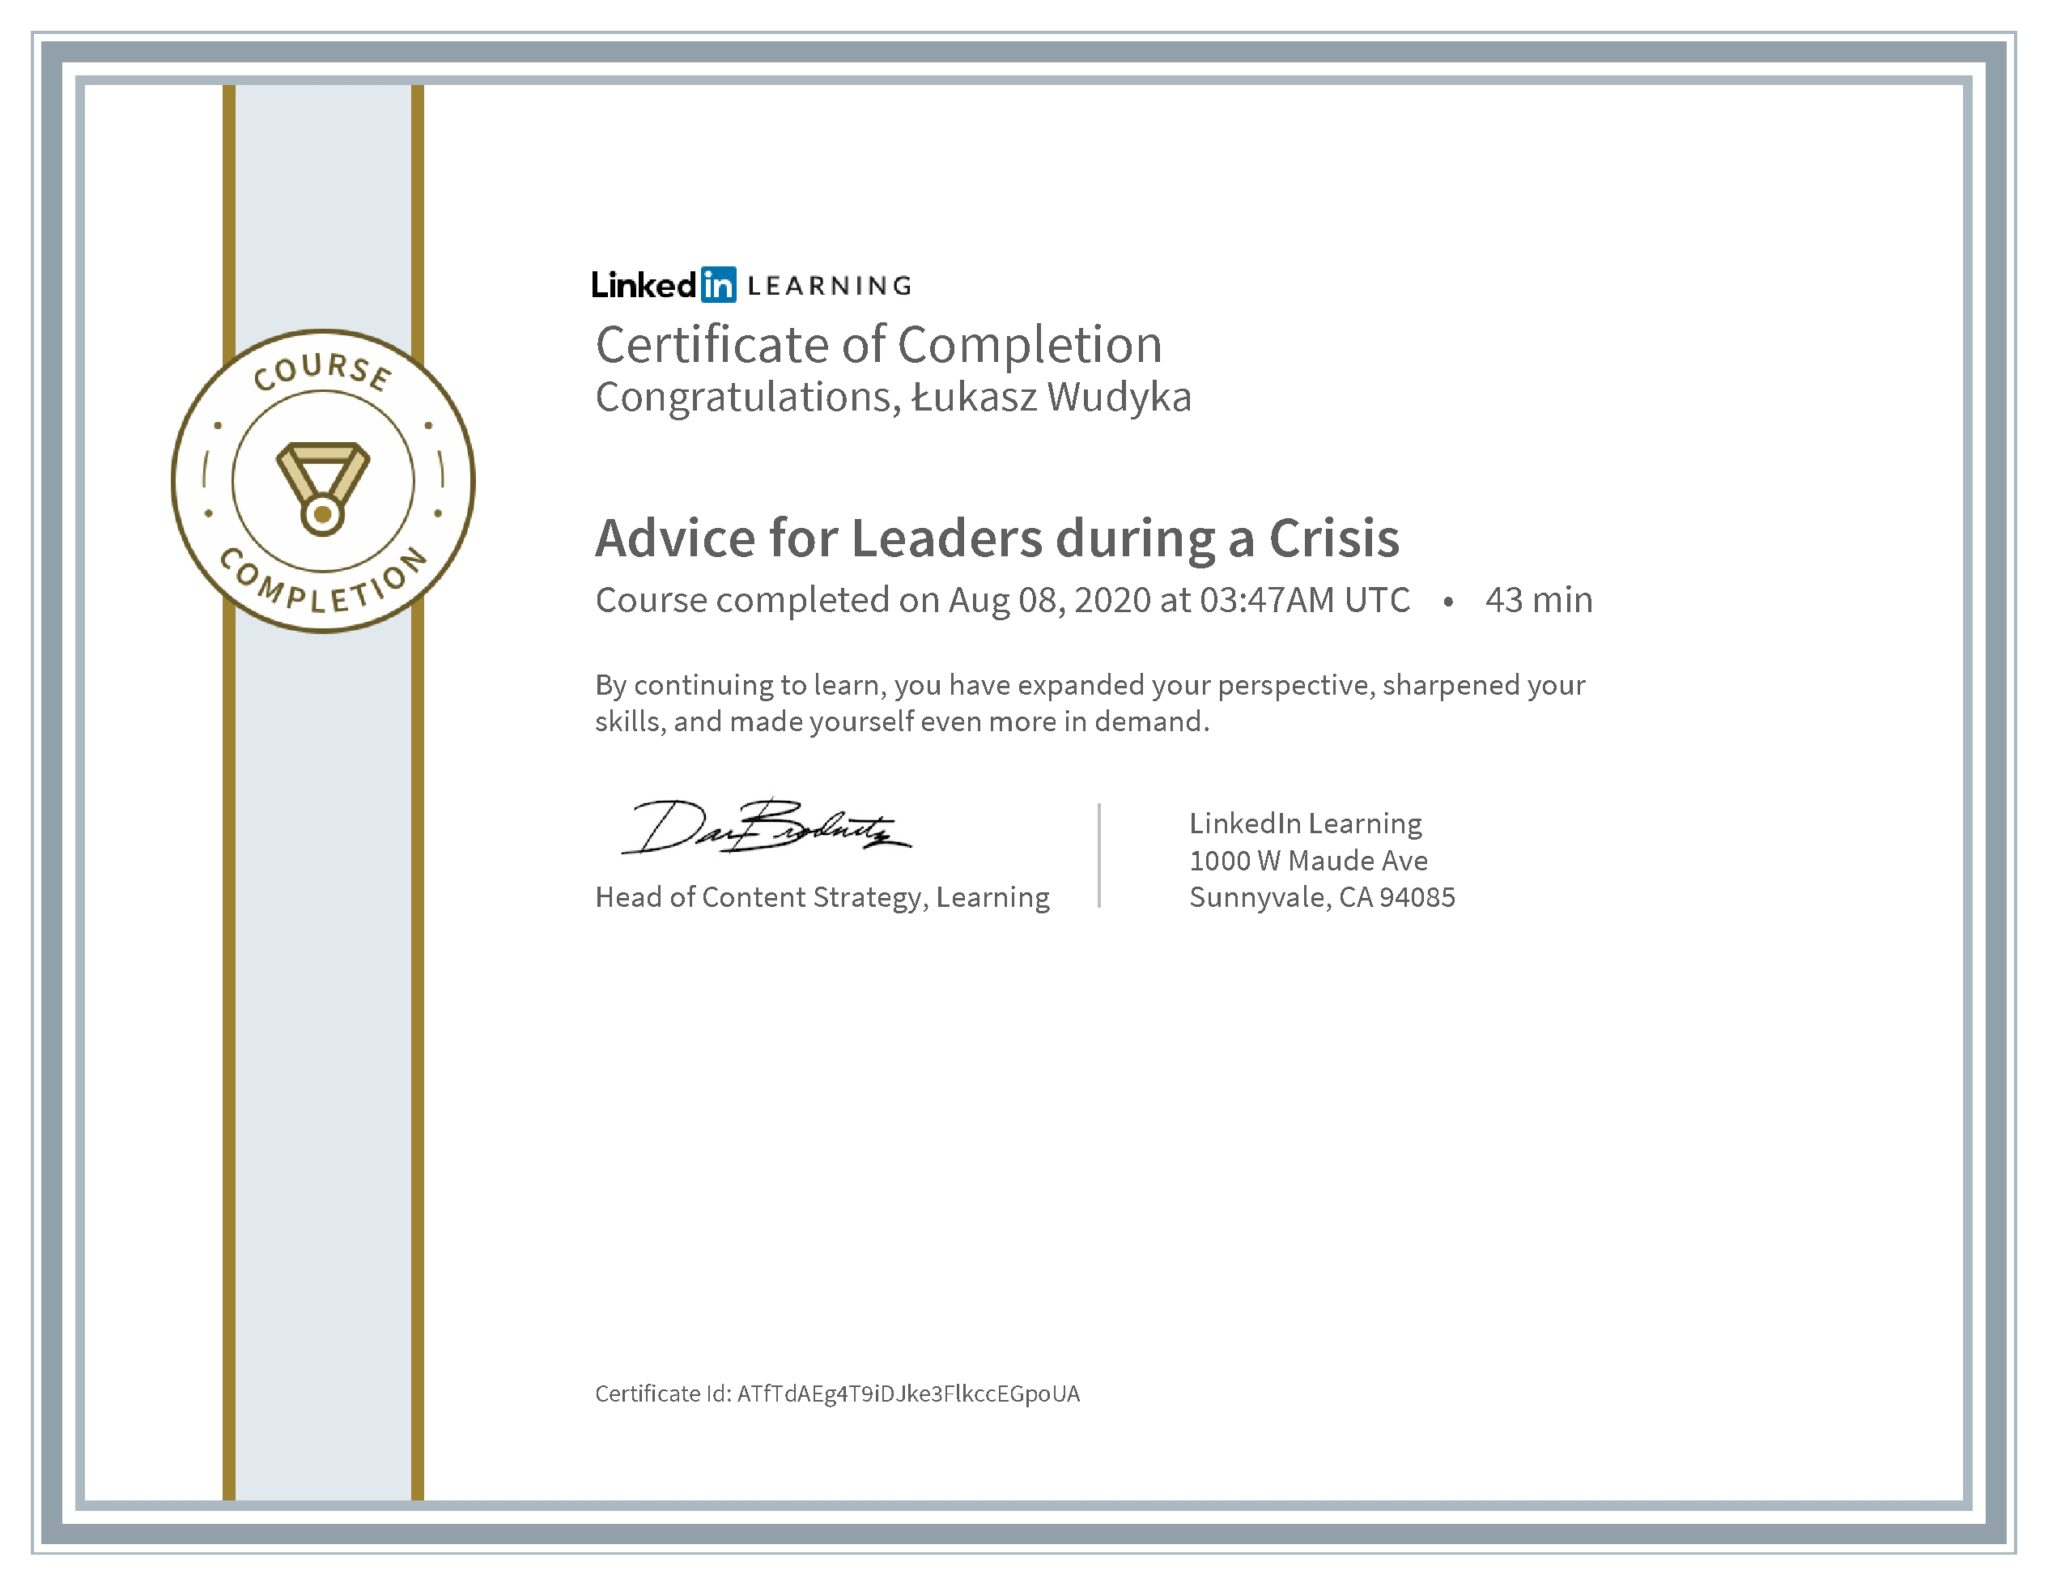 Łukasz Wudyka certyfikat LinkedIn Advice for Leaders during a Crisis